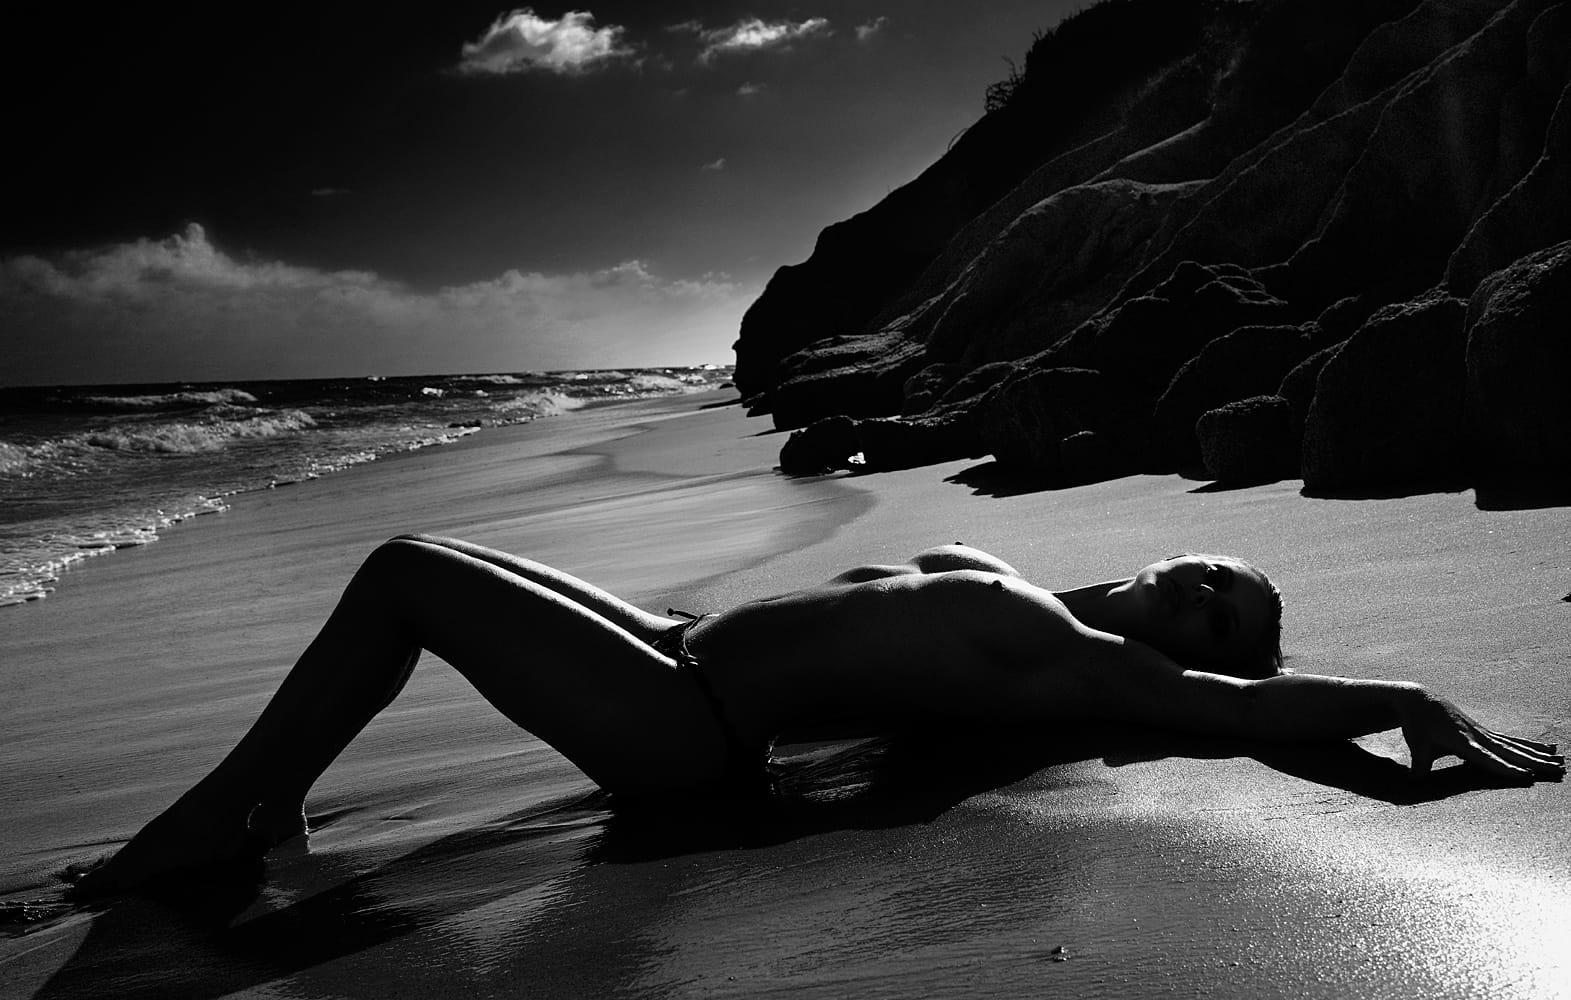 Amanda Streich Nude Photography Michael David Adams Photographer Limited Edition Black Sand Beach